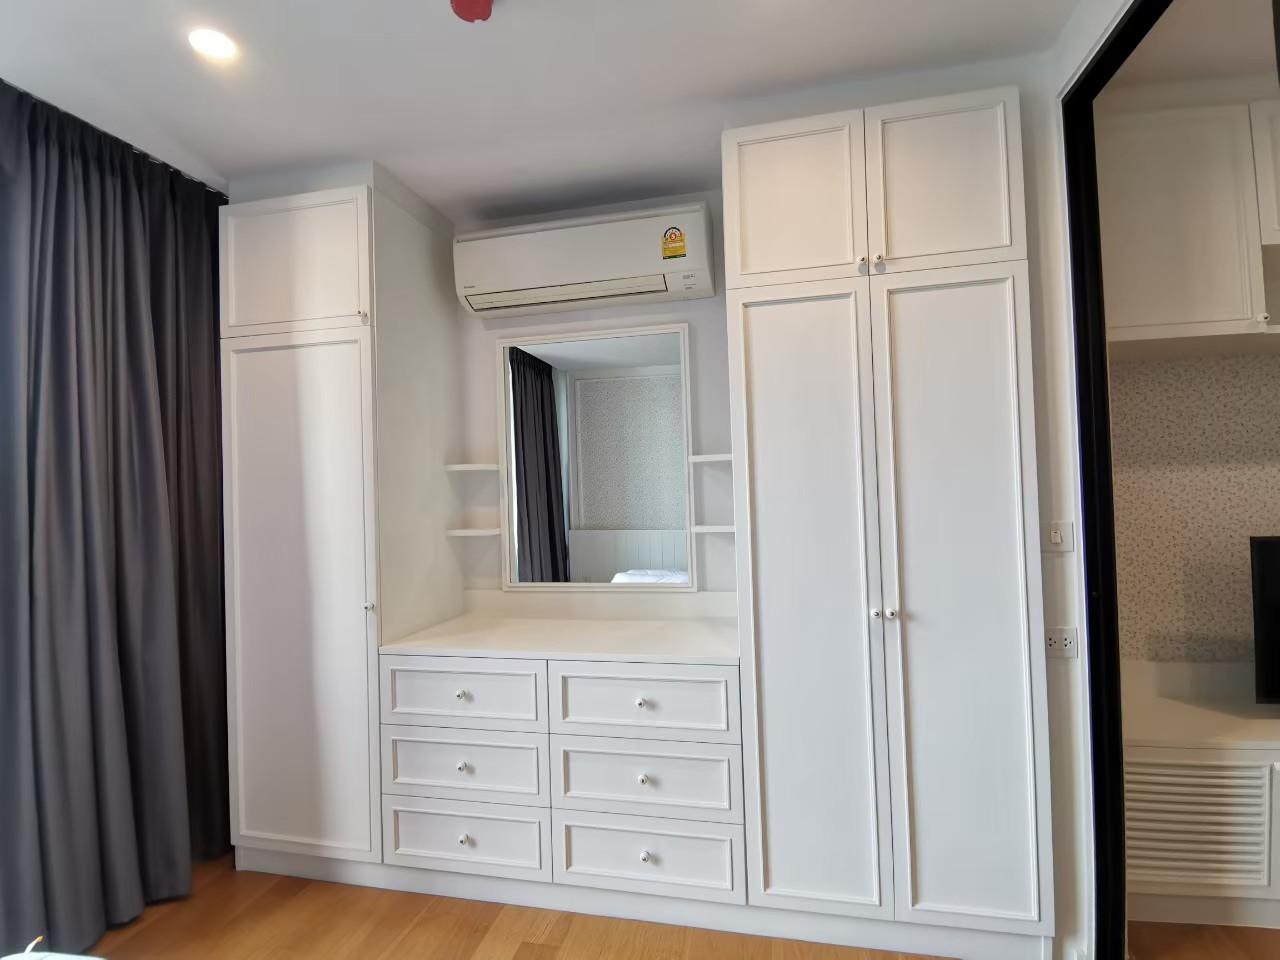 -For Rent- NOBLE REVO SILOM***Special Price 18,000***